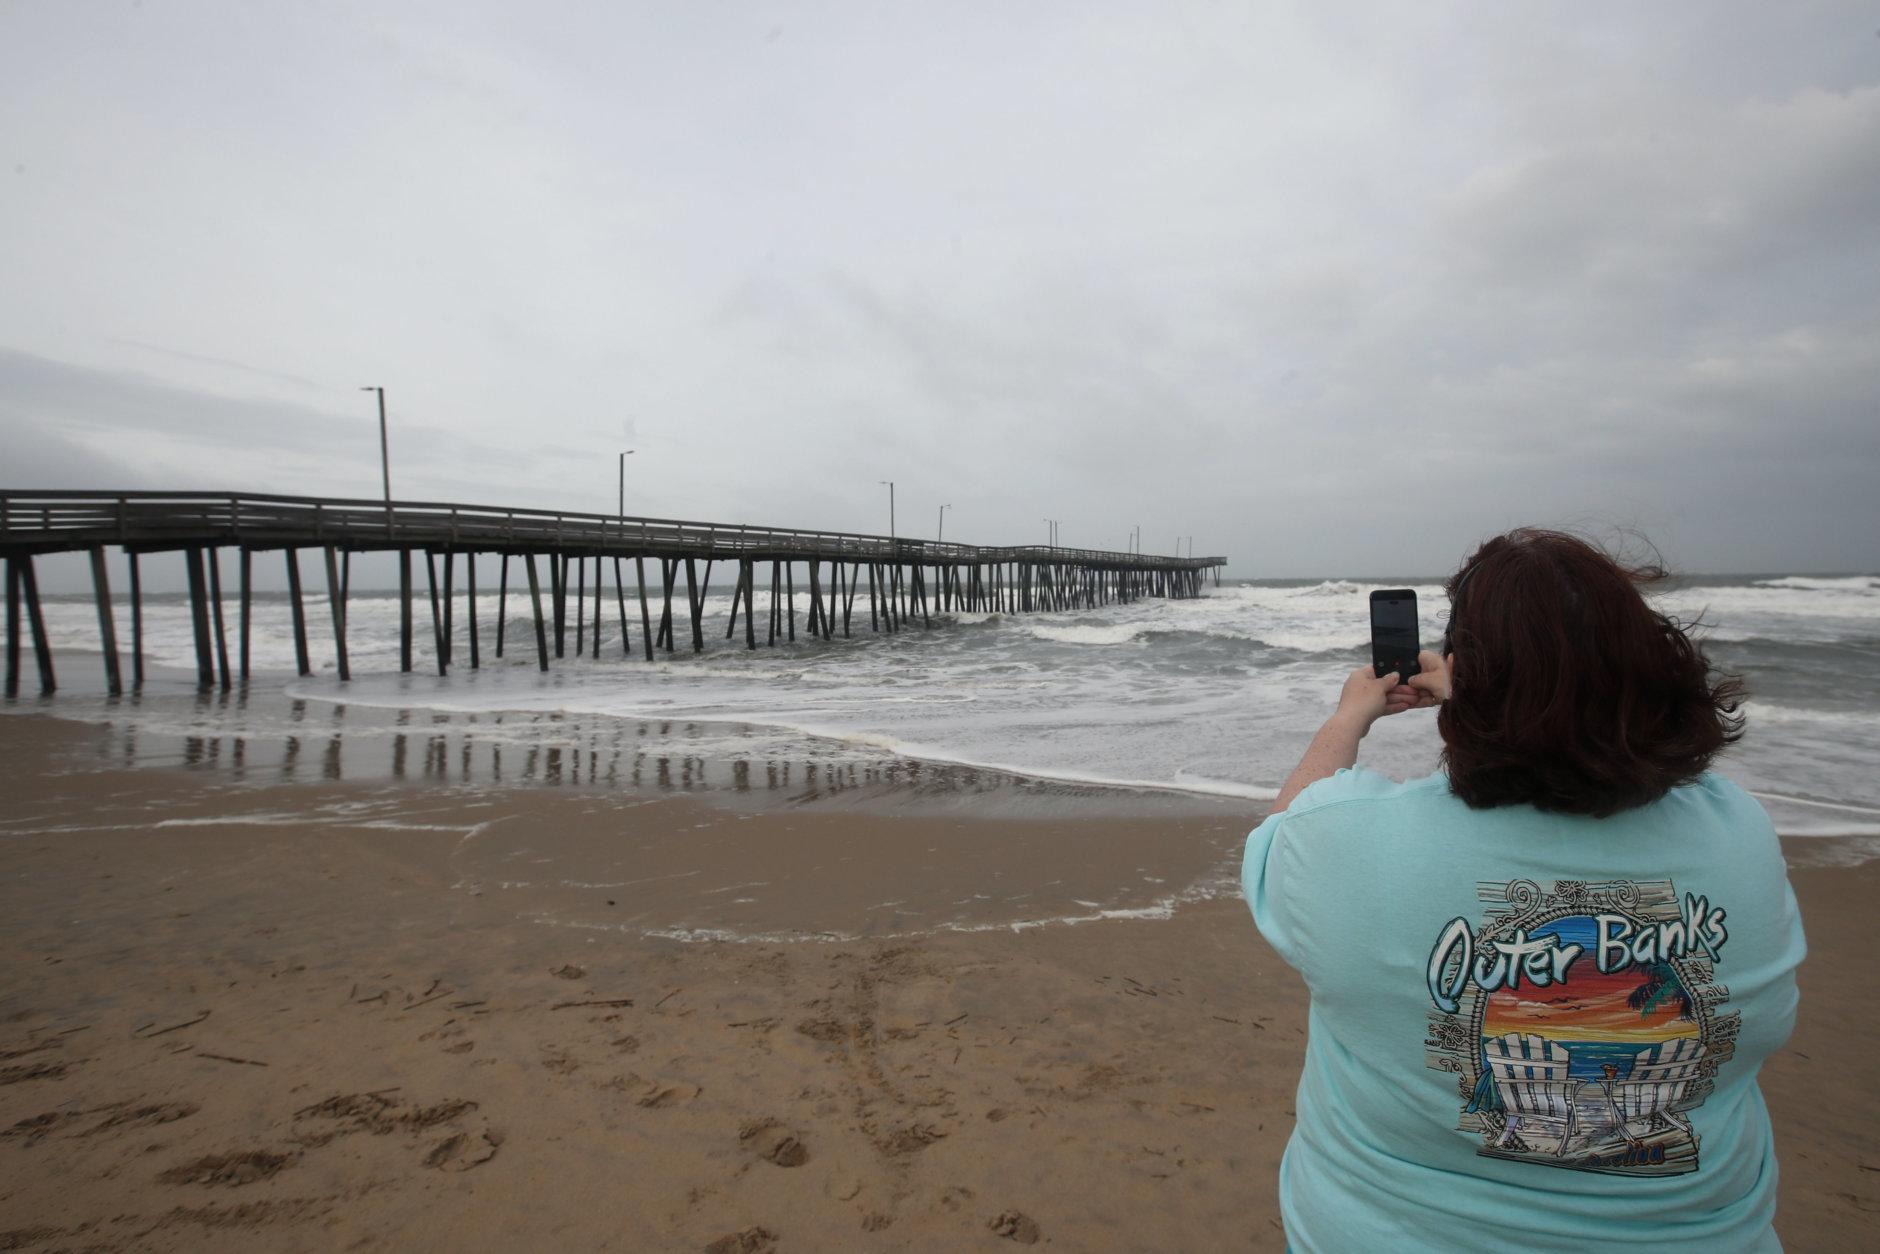 Lisa Postlewait, from Virginia Beach, Va., takes a picture near the Virginia Beach Fishing Pier , Thursday, Sept. 13, 2018, in Virginia Beach, Va., as Hurricane Florence moves towards the eastern shore. (AP Photo/Alex Brandon)